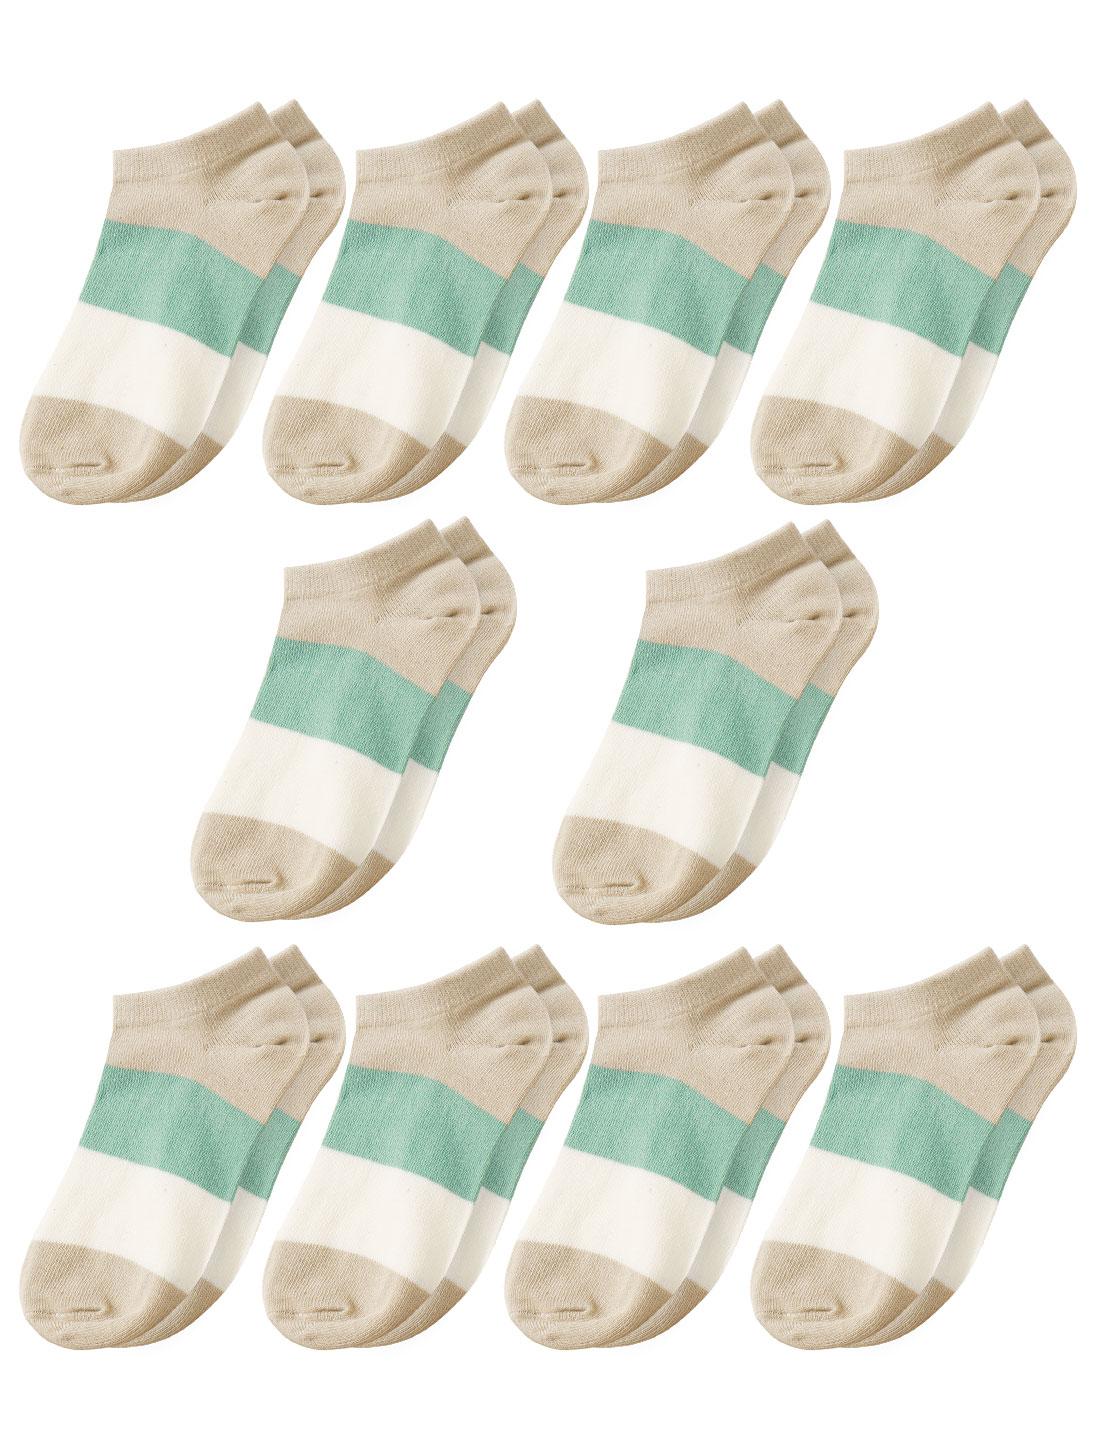 Women Low Cut Ankle Length Color Block Short Socks 10 Pairs Beige 9-11